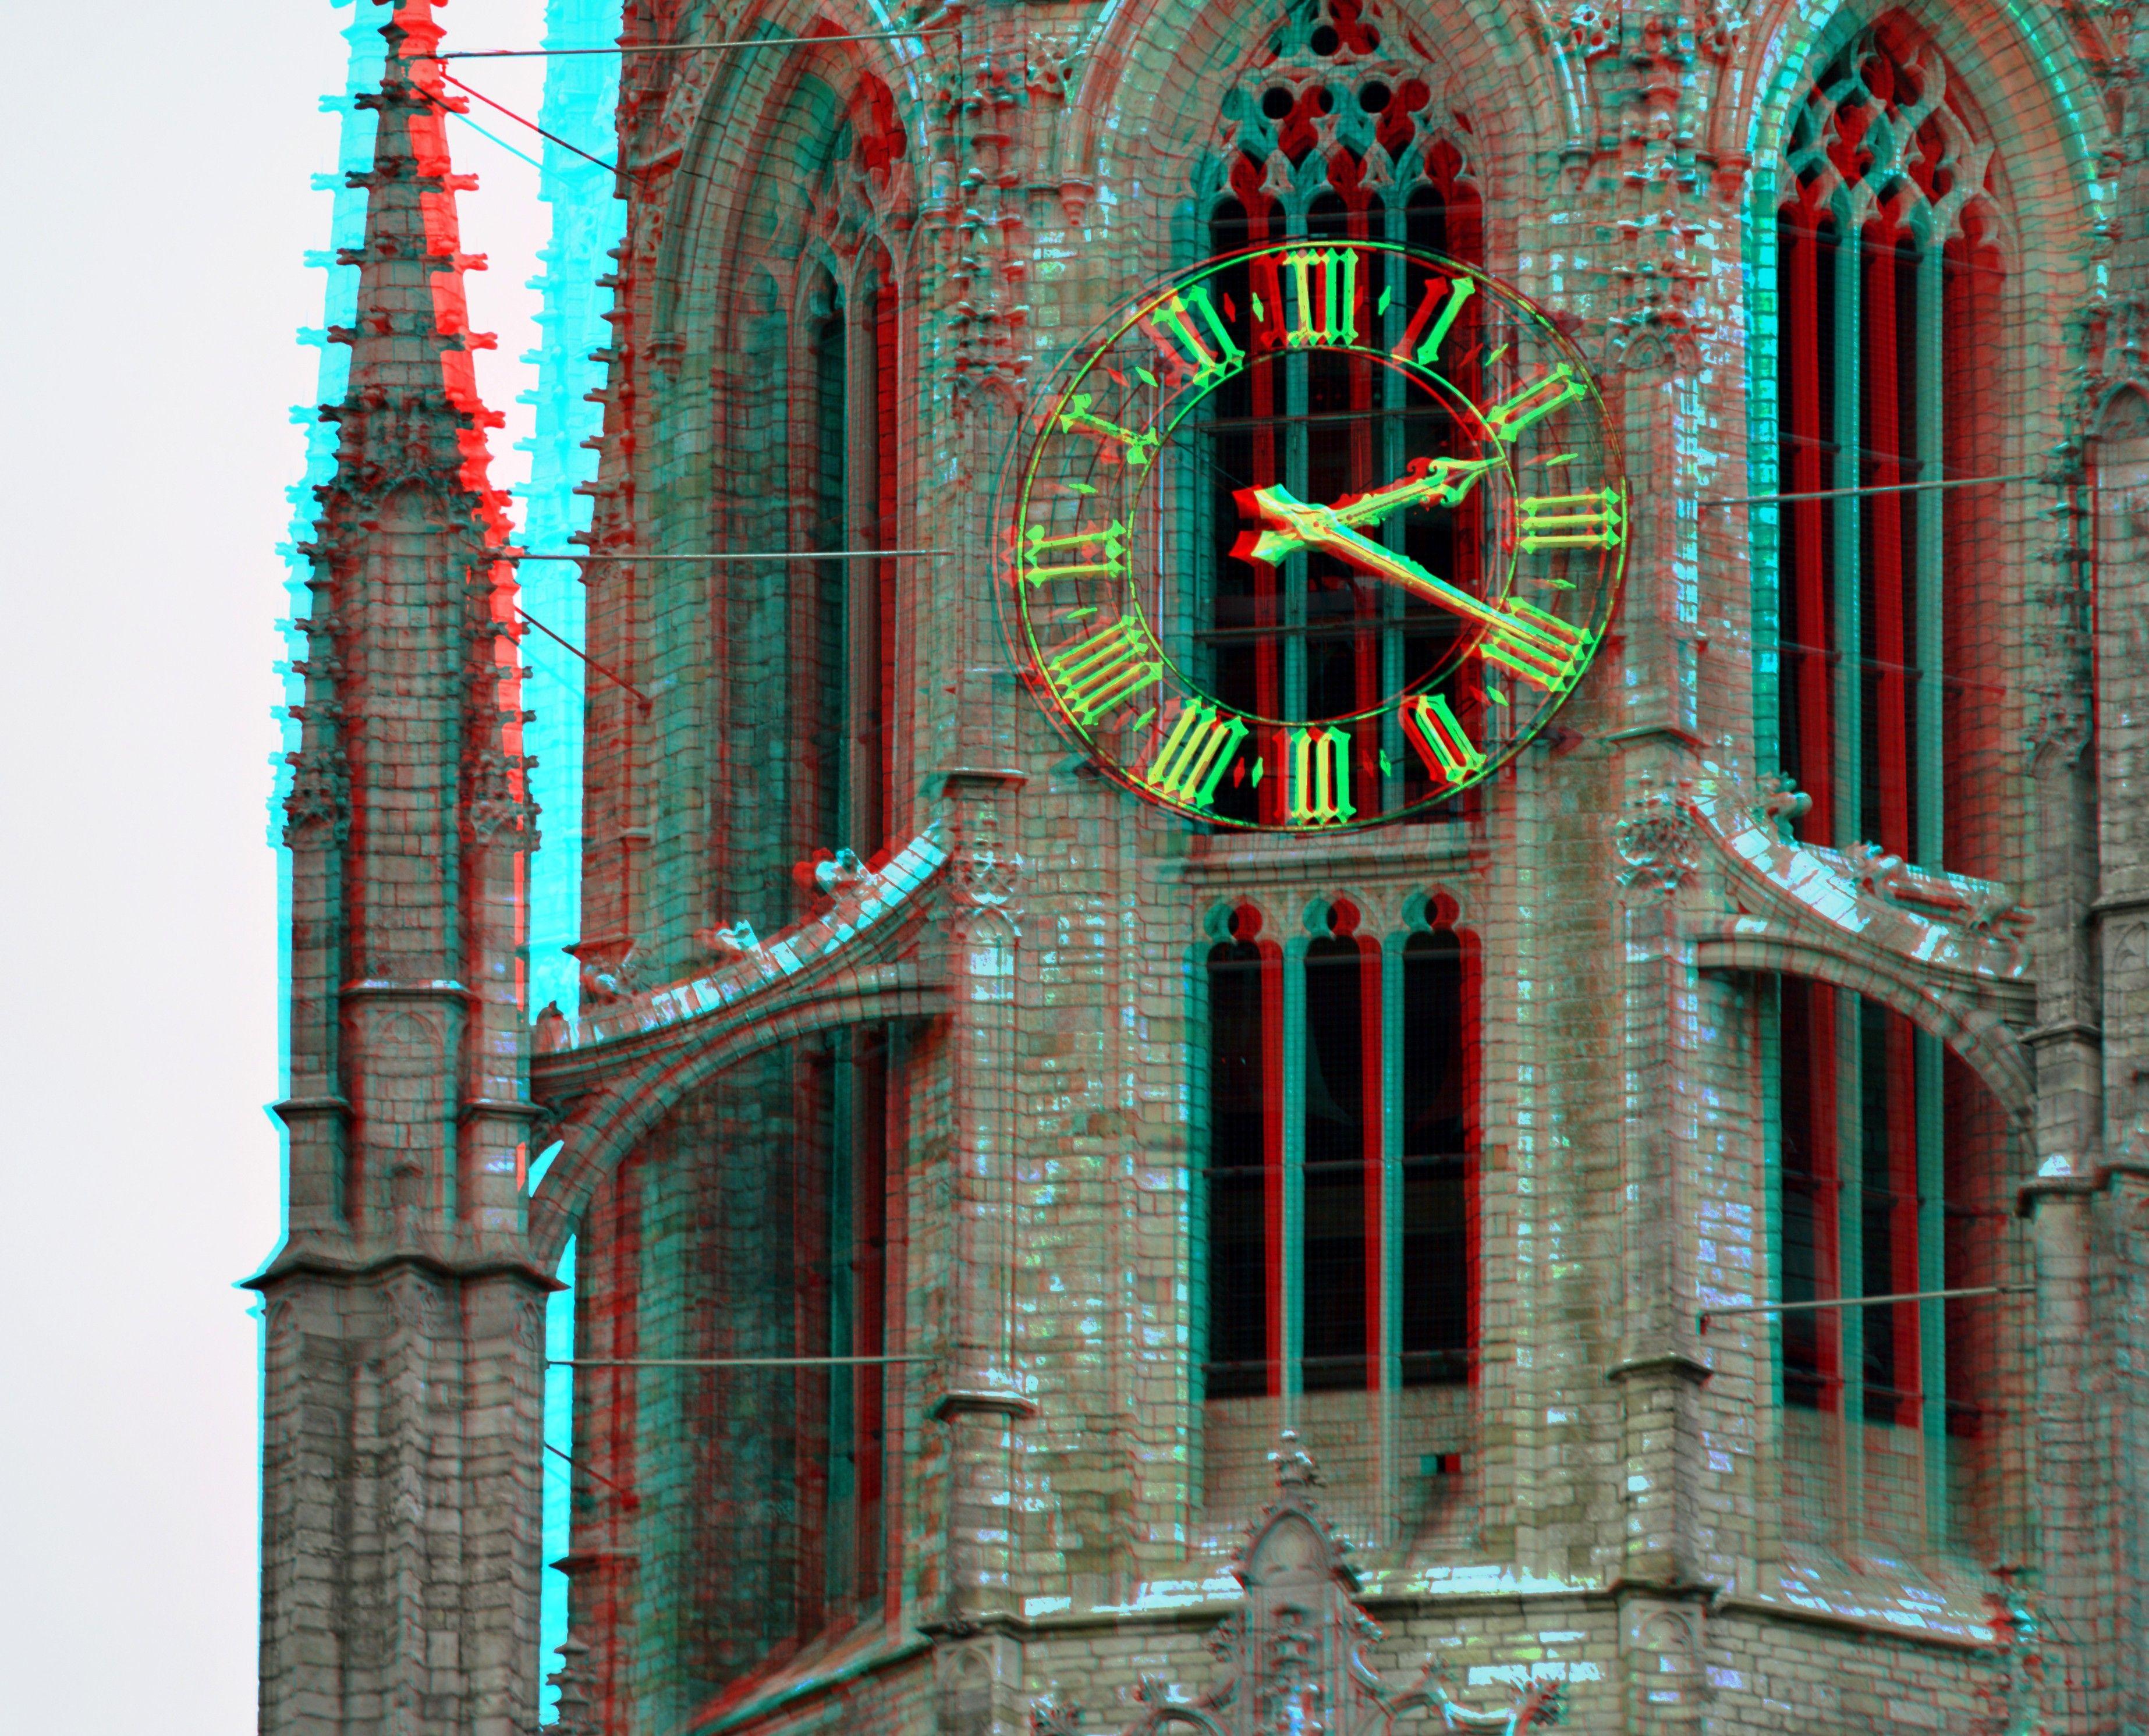 Toren Grote Kerk Breda 3D